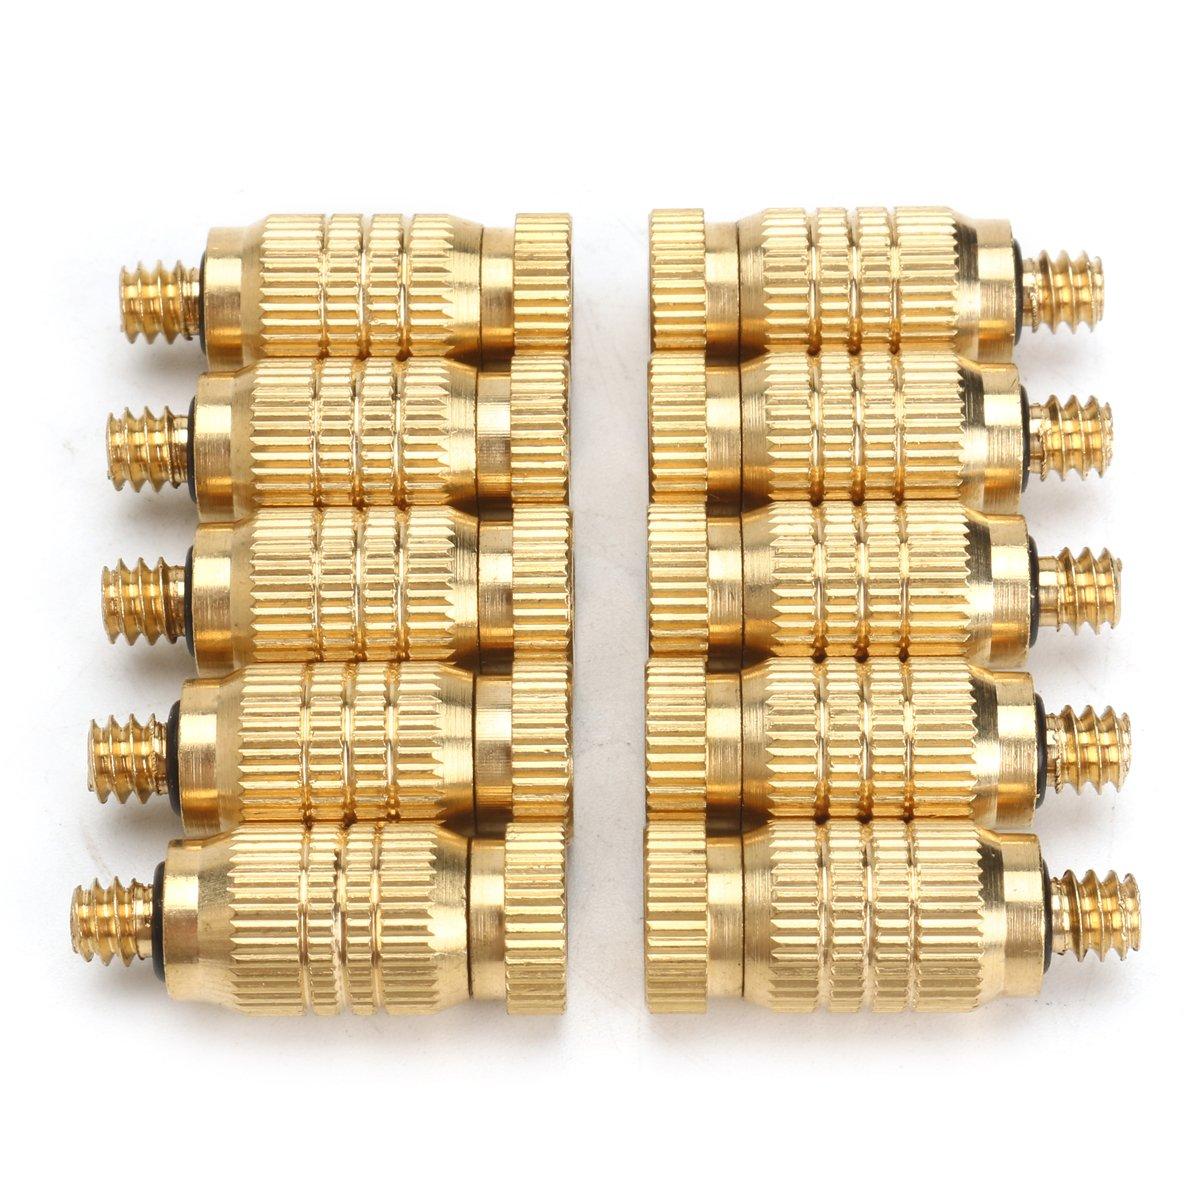 10Pcs 4mm Male Threaded Brass Misting Fogging Nozzle Spray Sprinkler Head Irrigation Cooling by Ologymart (Image #2)